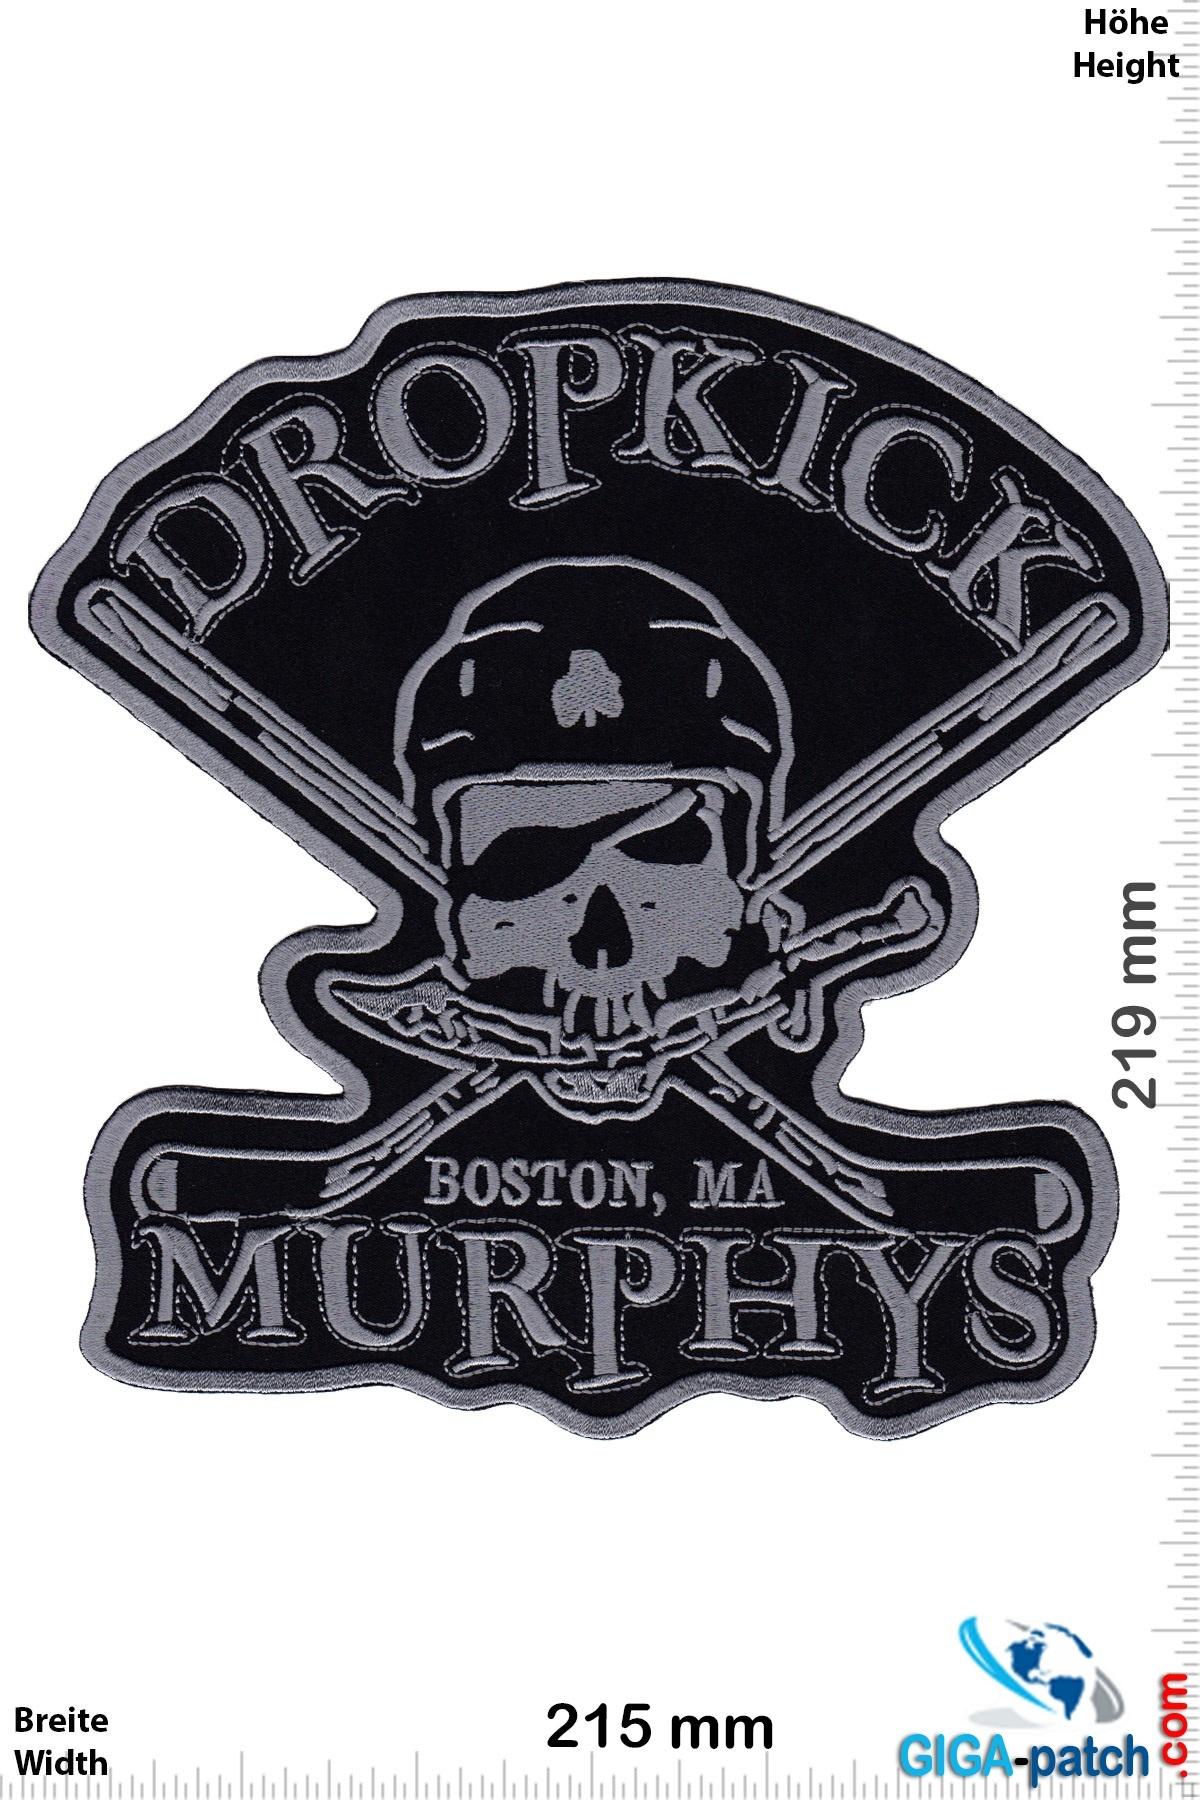 Dropkick Murphys  Dropkick Murphys - Boston - darksilver  - 18 cm - BIG